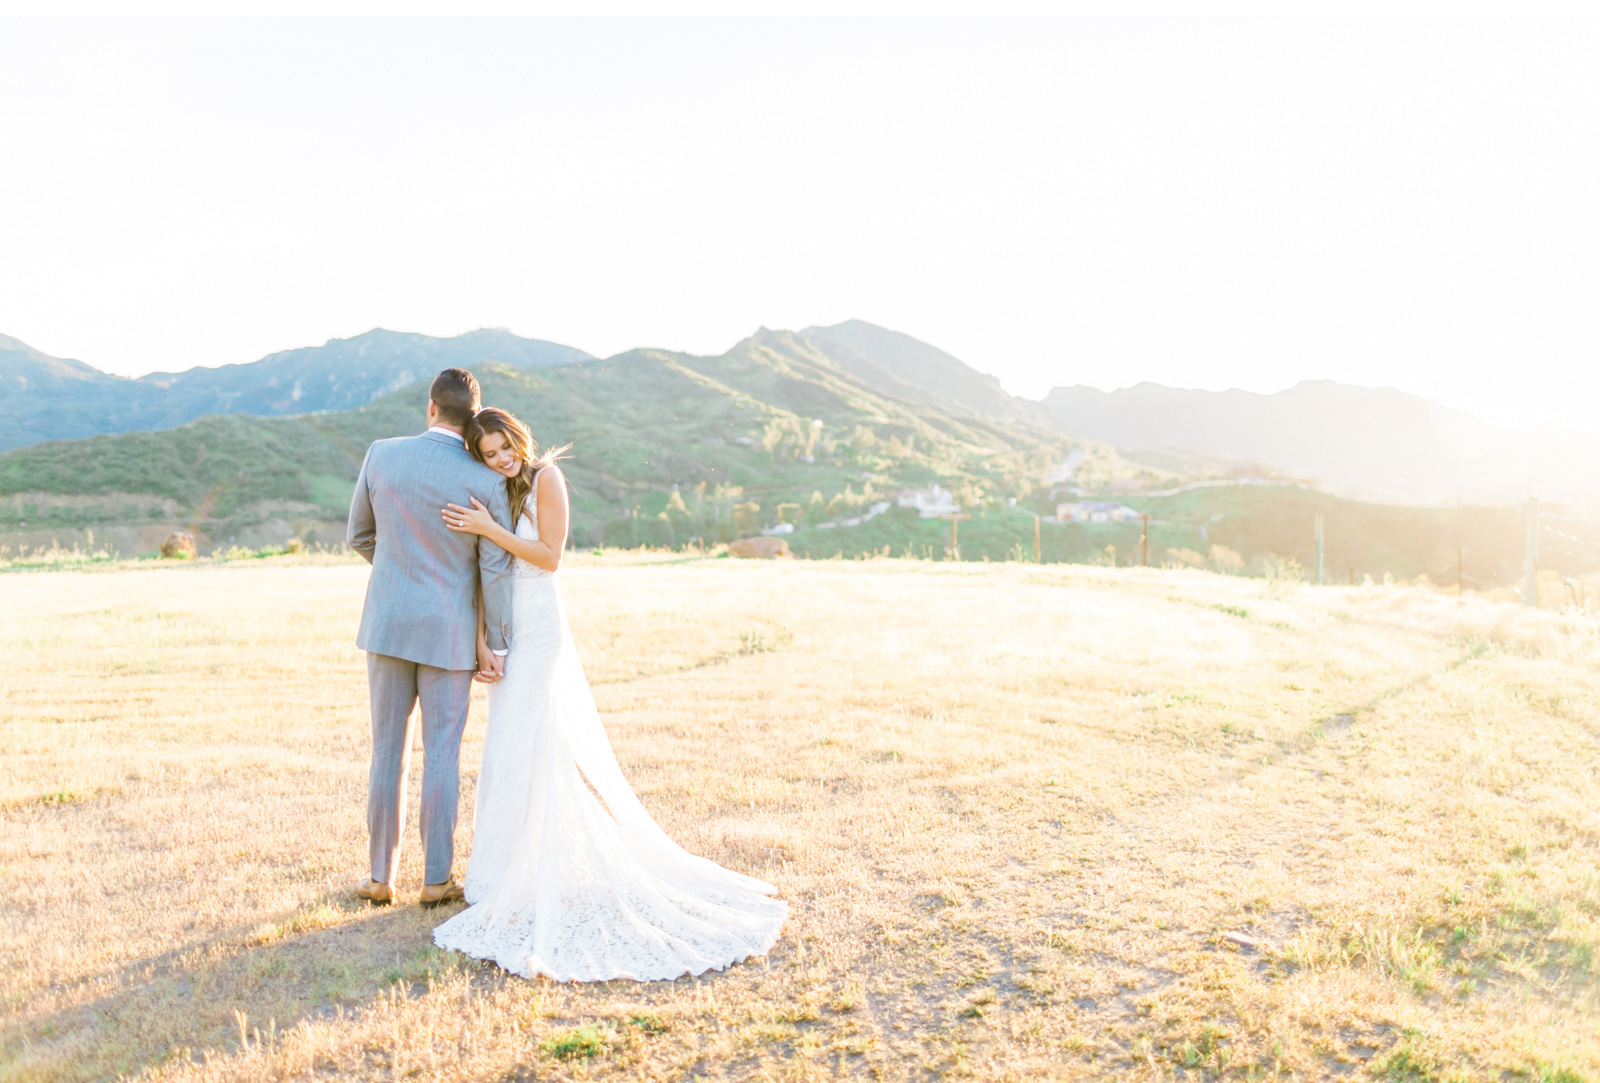 Triunfo-Creek-Malibu-Wedding-Natalie-Schutt-Photography-Couture-Events-Style-Me-Pretty_03.jpg